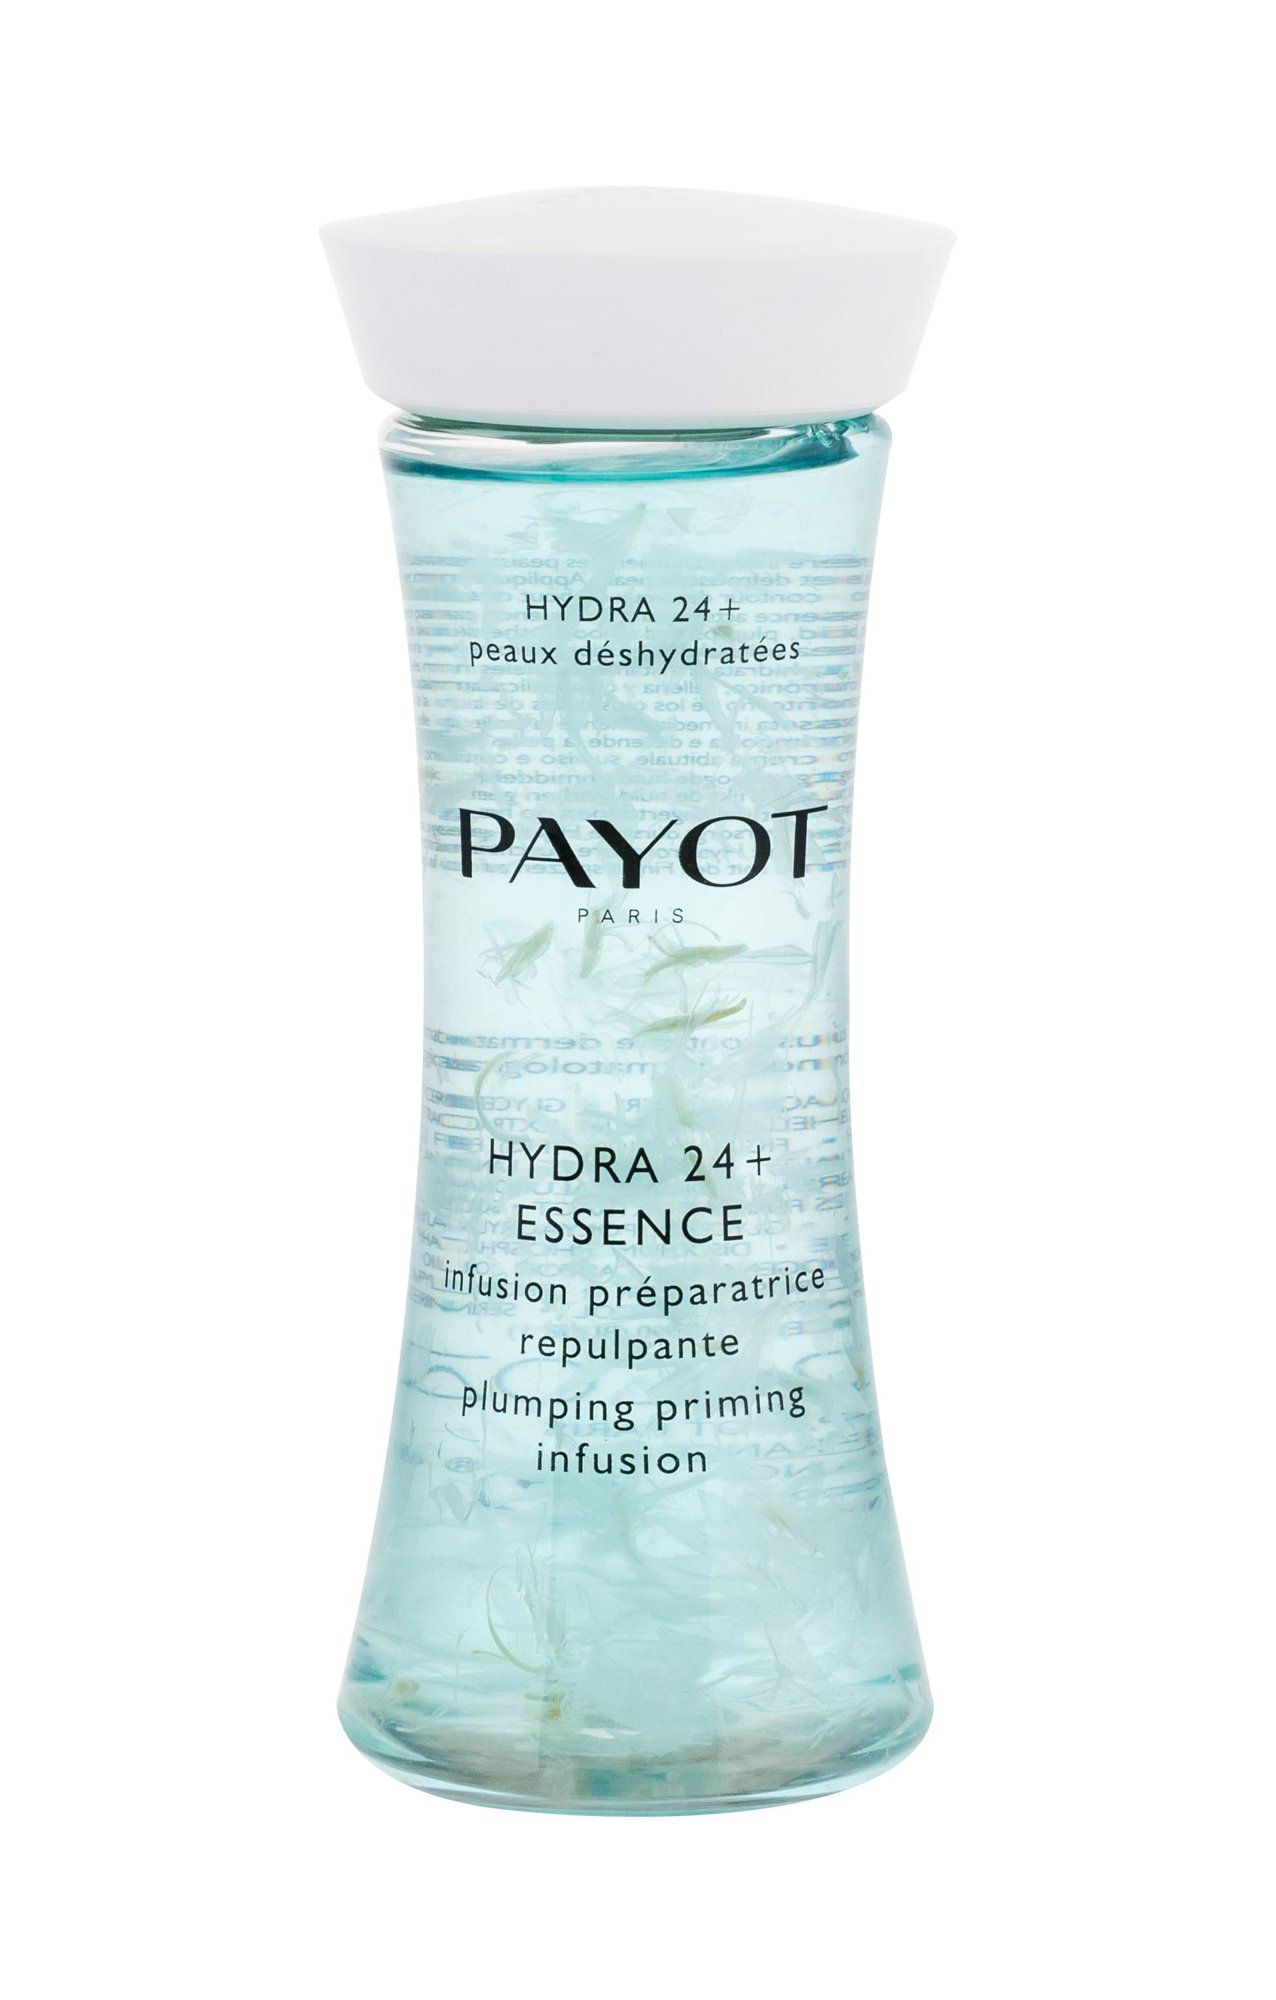 PAYOT Hydra 24+ Skin Serum 125ml  Essence